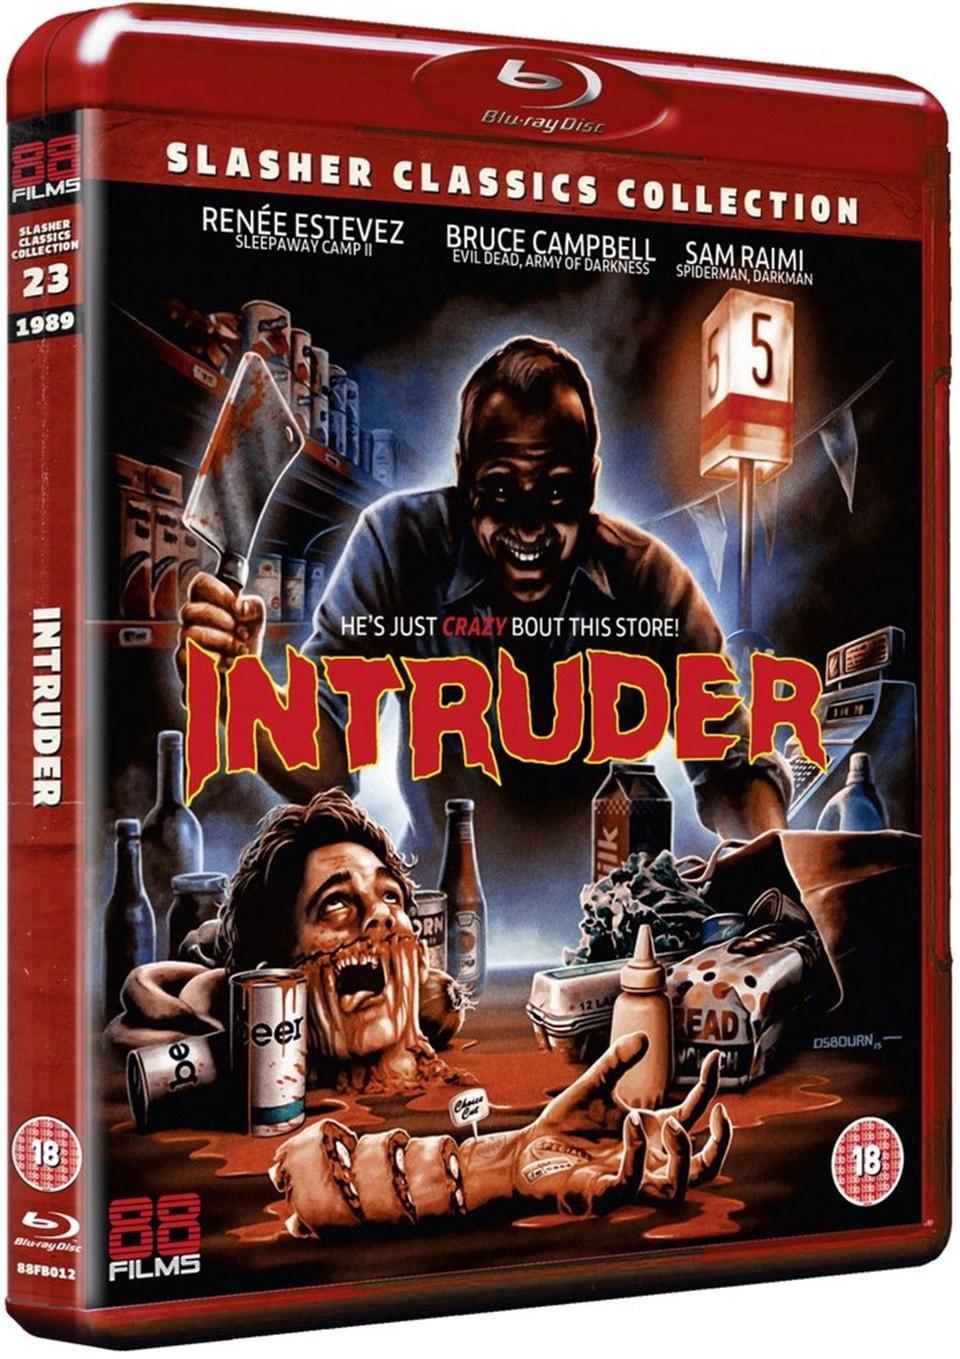 Intruder - 2